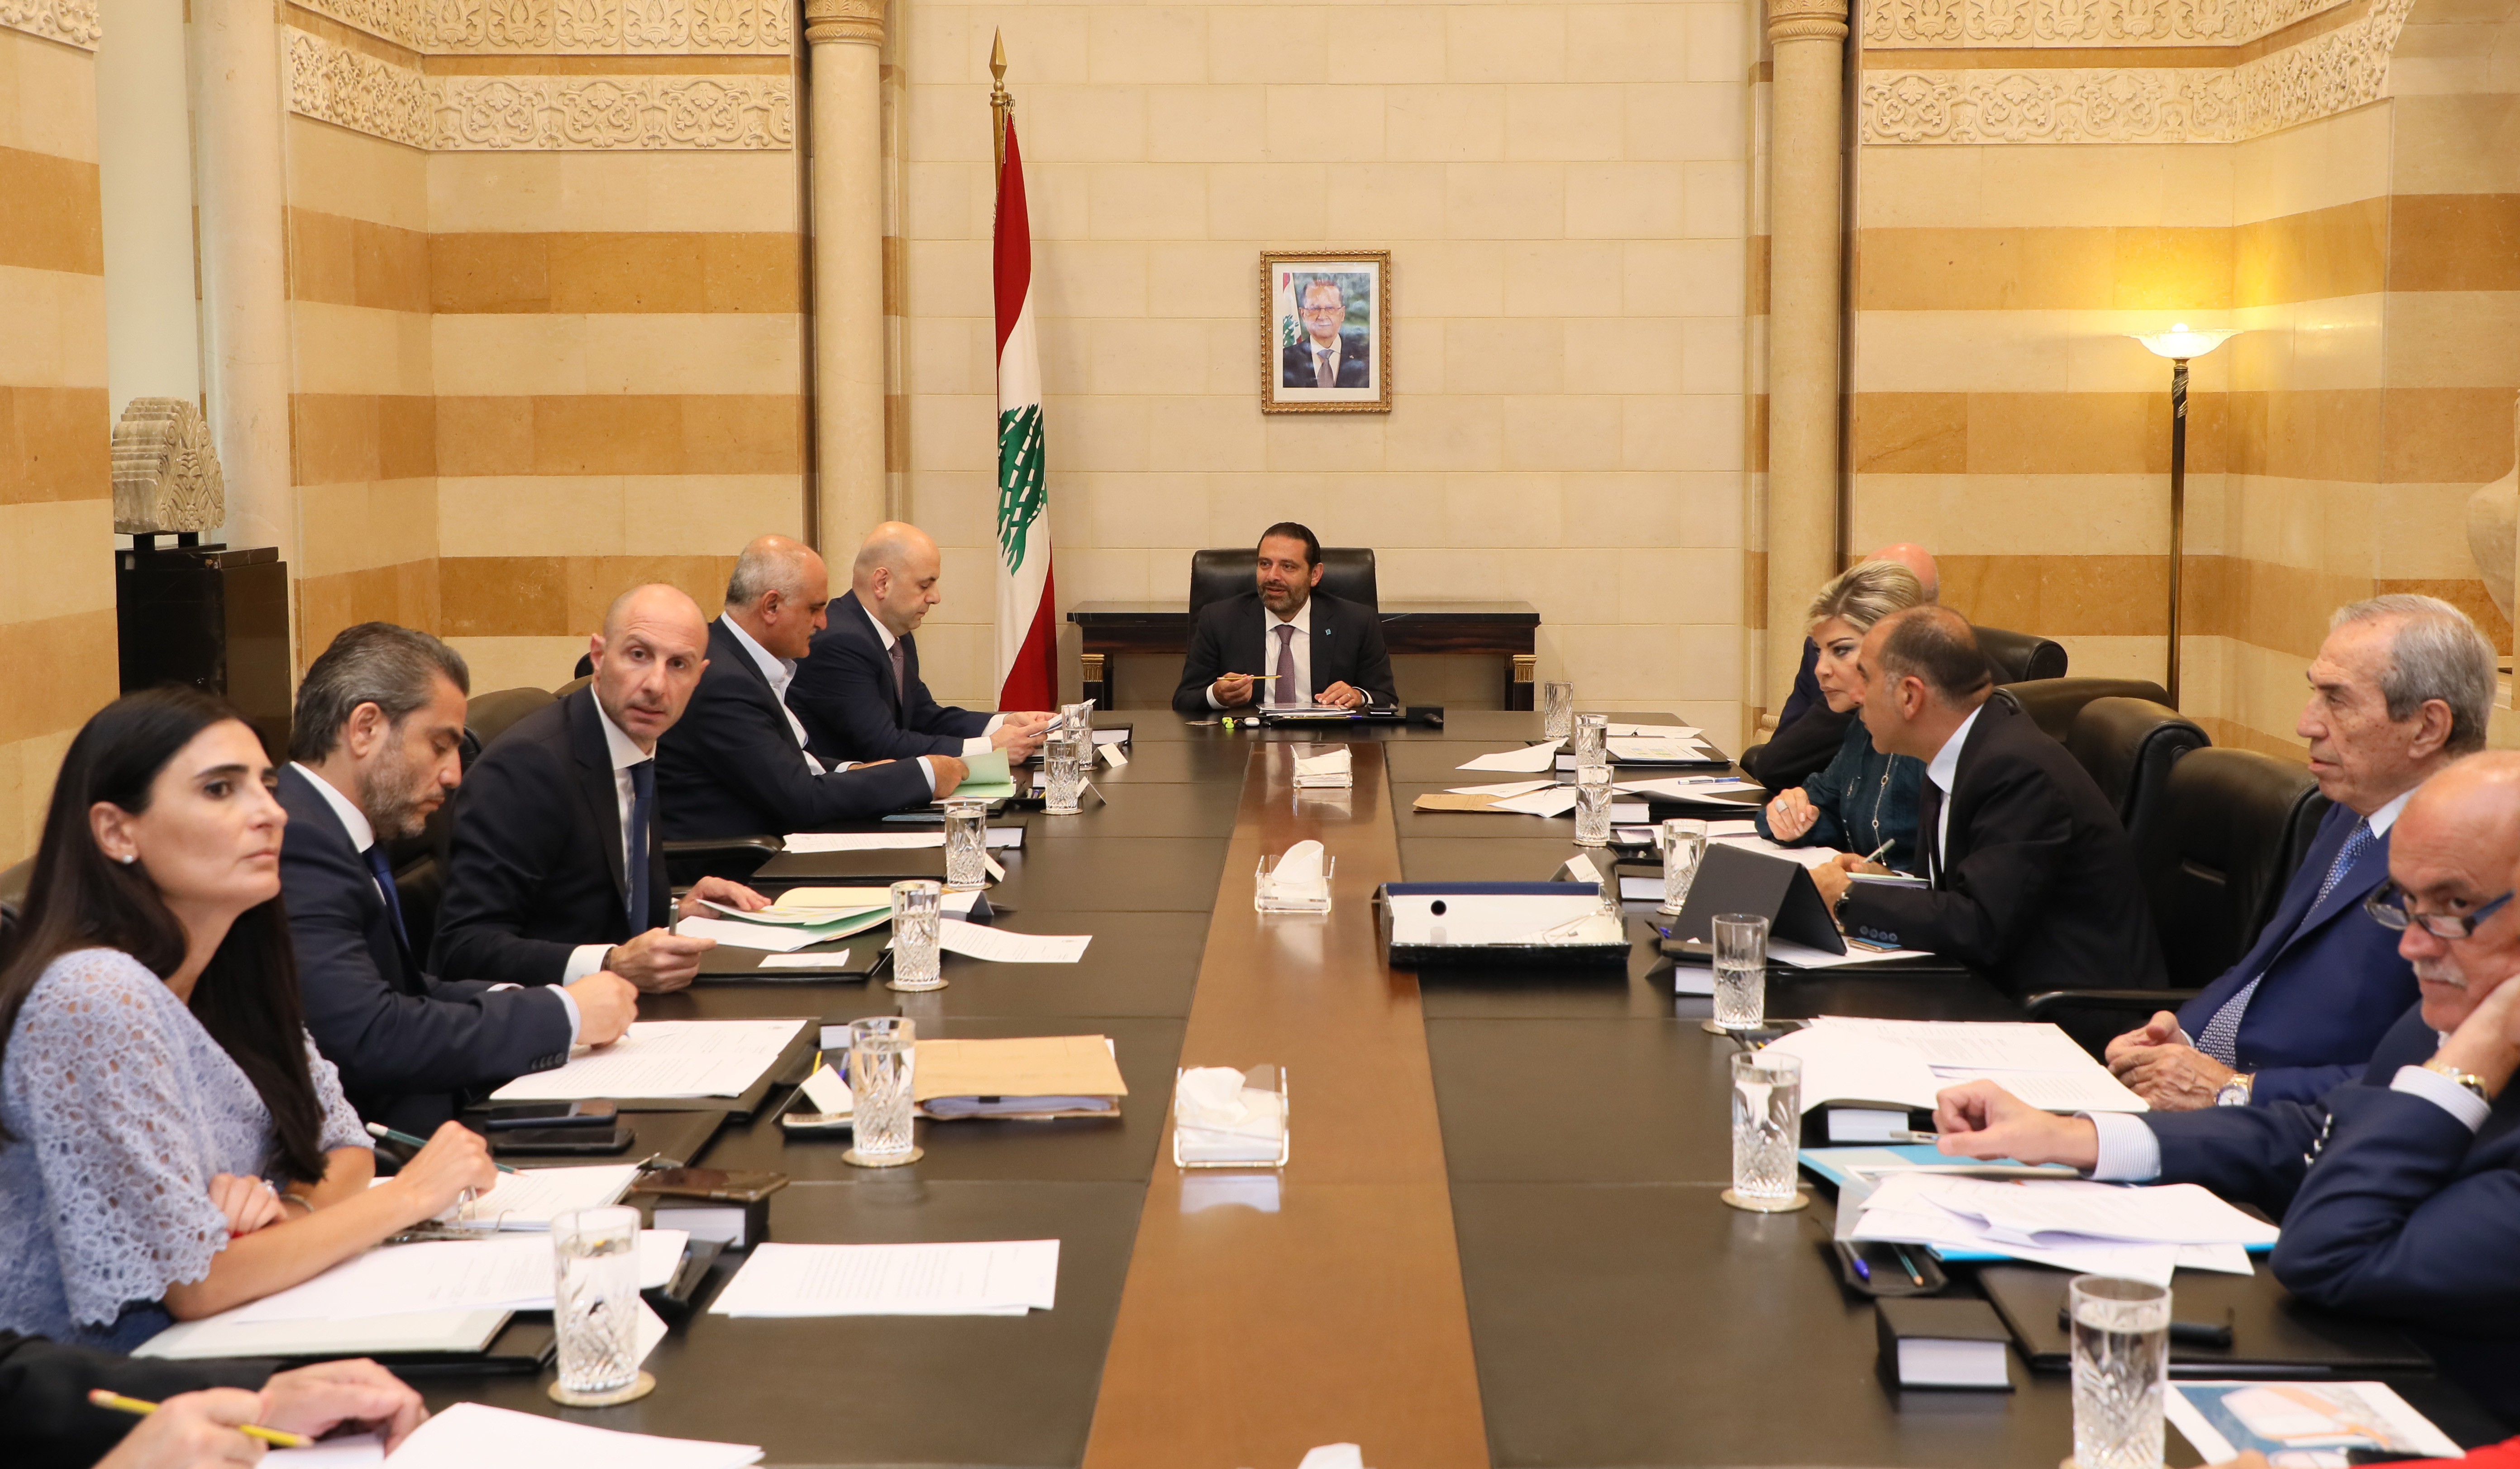 Pr Minister Saad Hariri Heading a Enviroment Committe